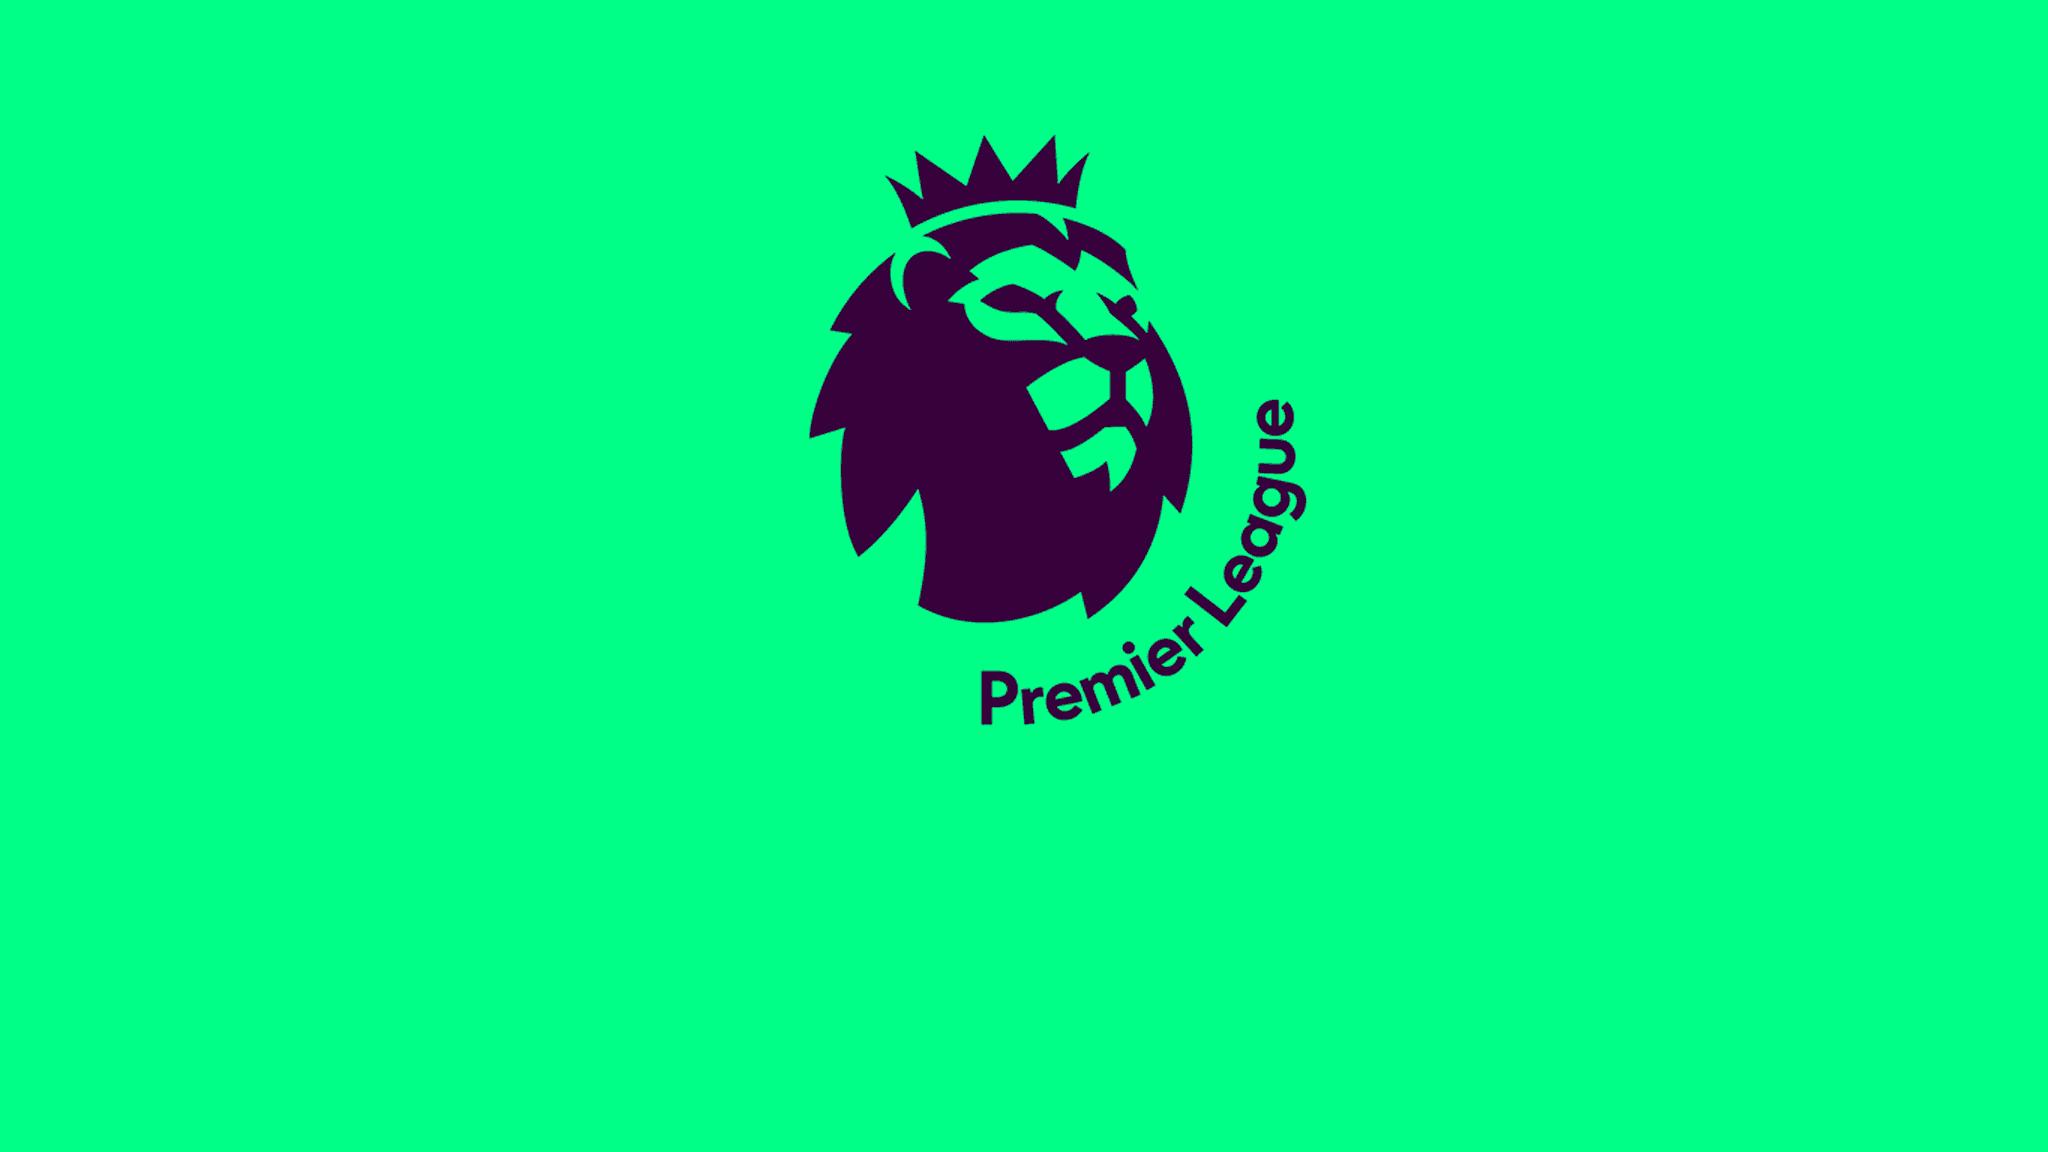 Watch Premier League Live Stream Dazn Jp